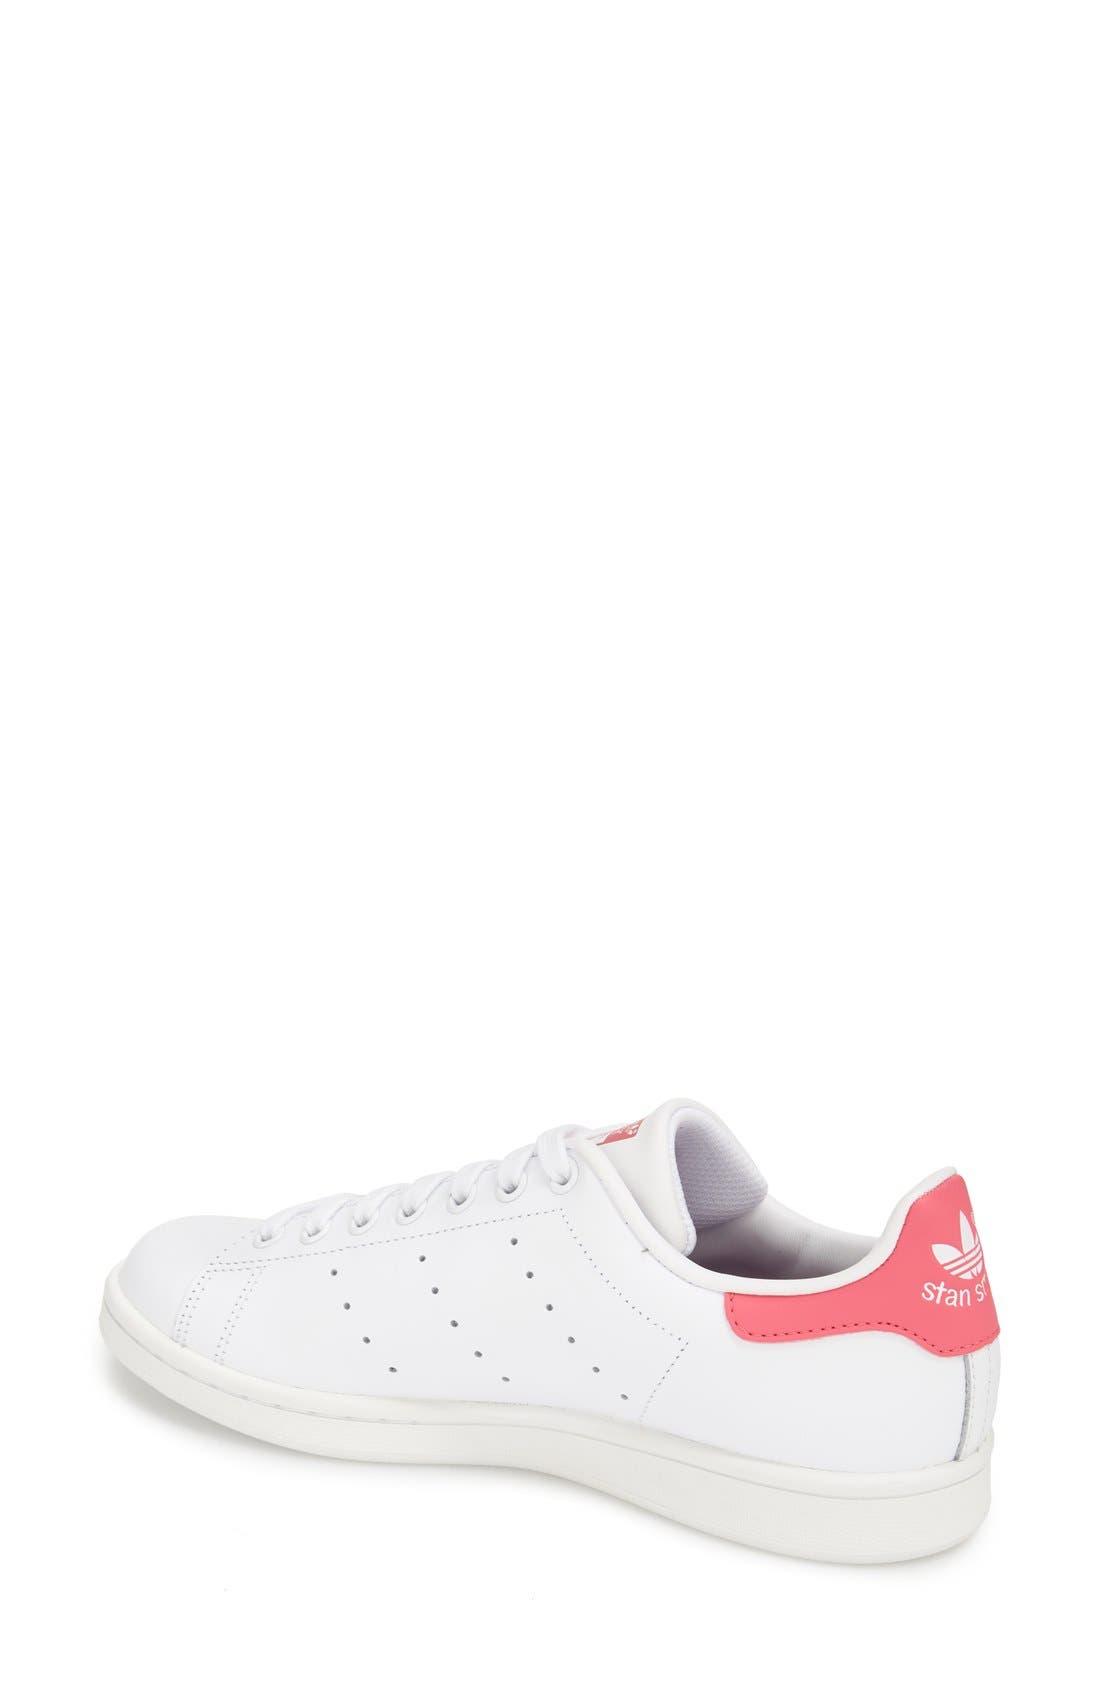 'Stan Smith' Sneaker,                             Alternate thumbnail 40, color,